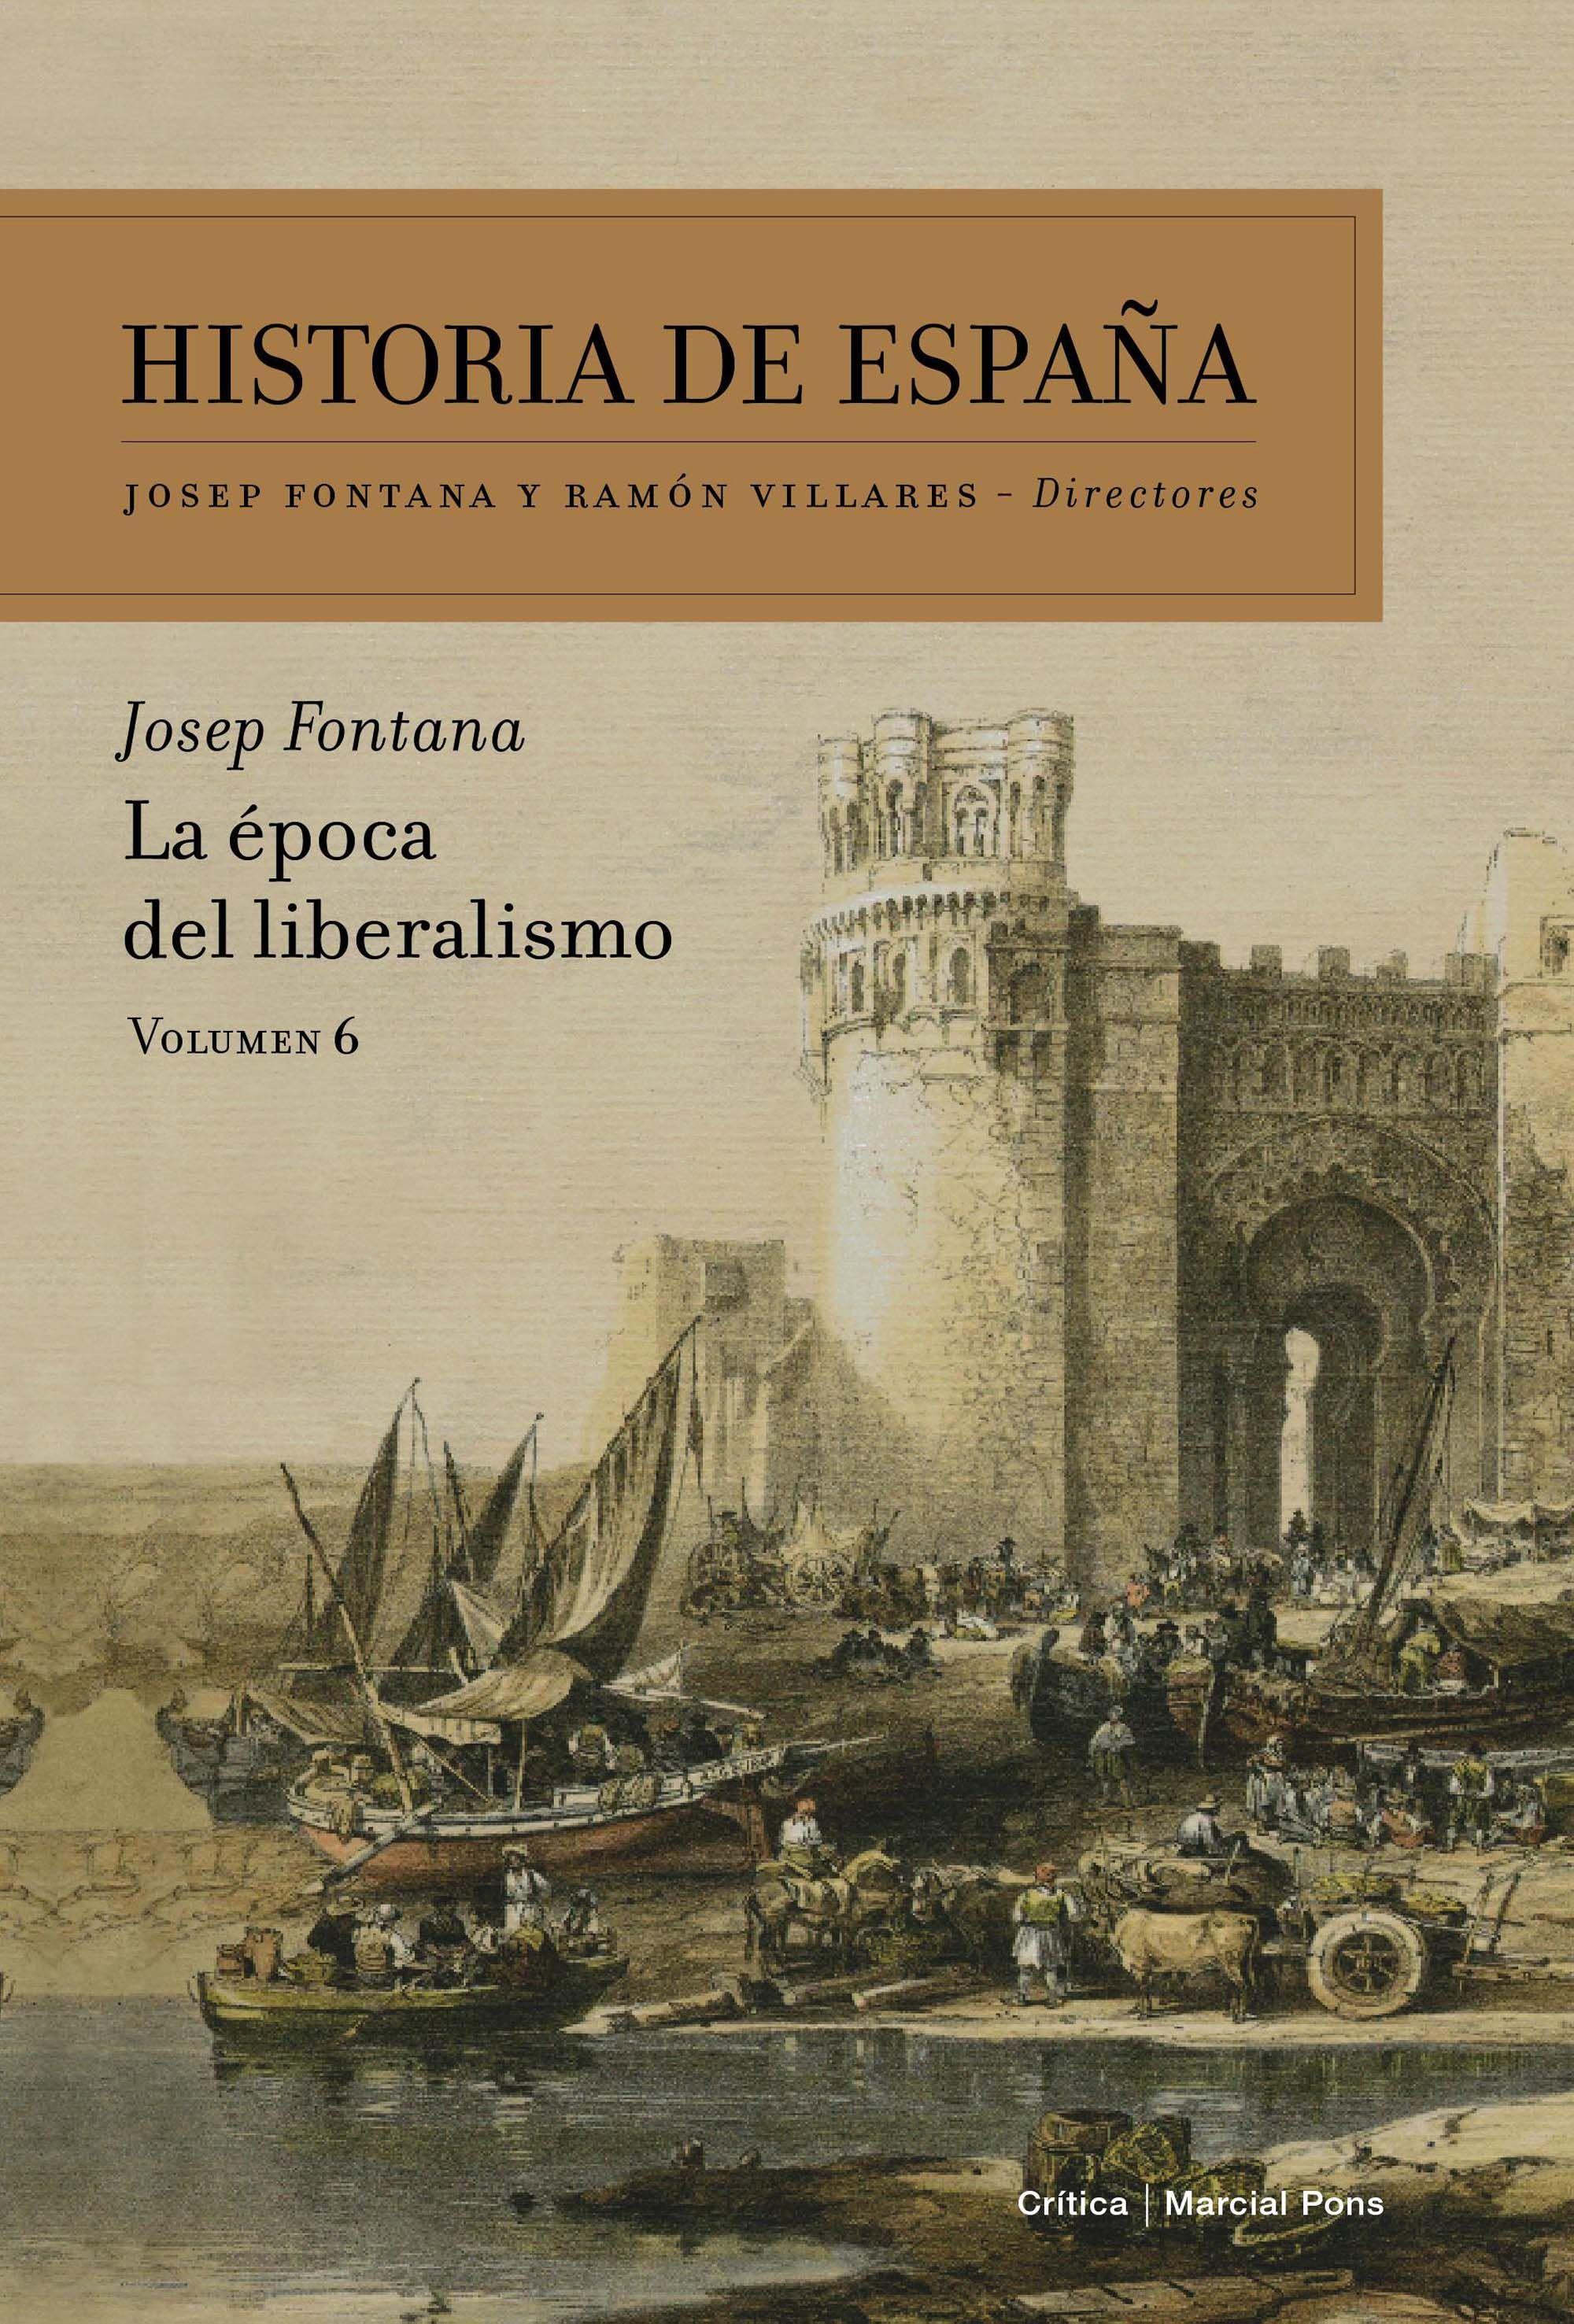 La época del liberalismo · Libros de historia